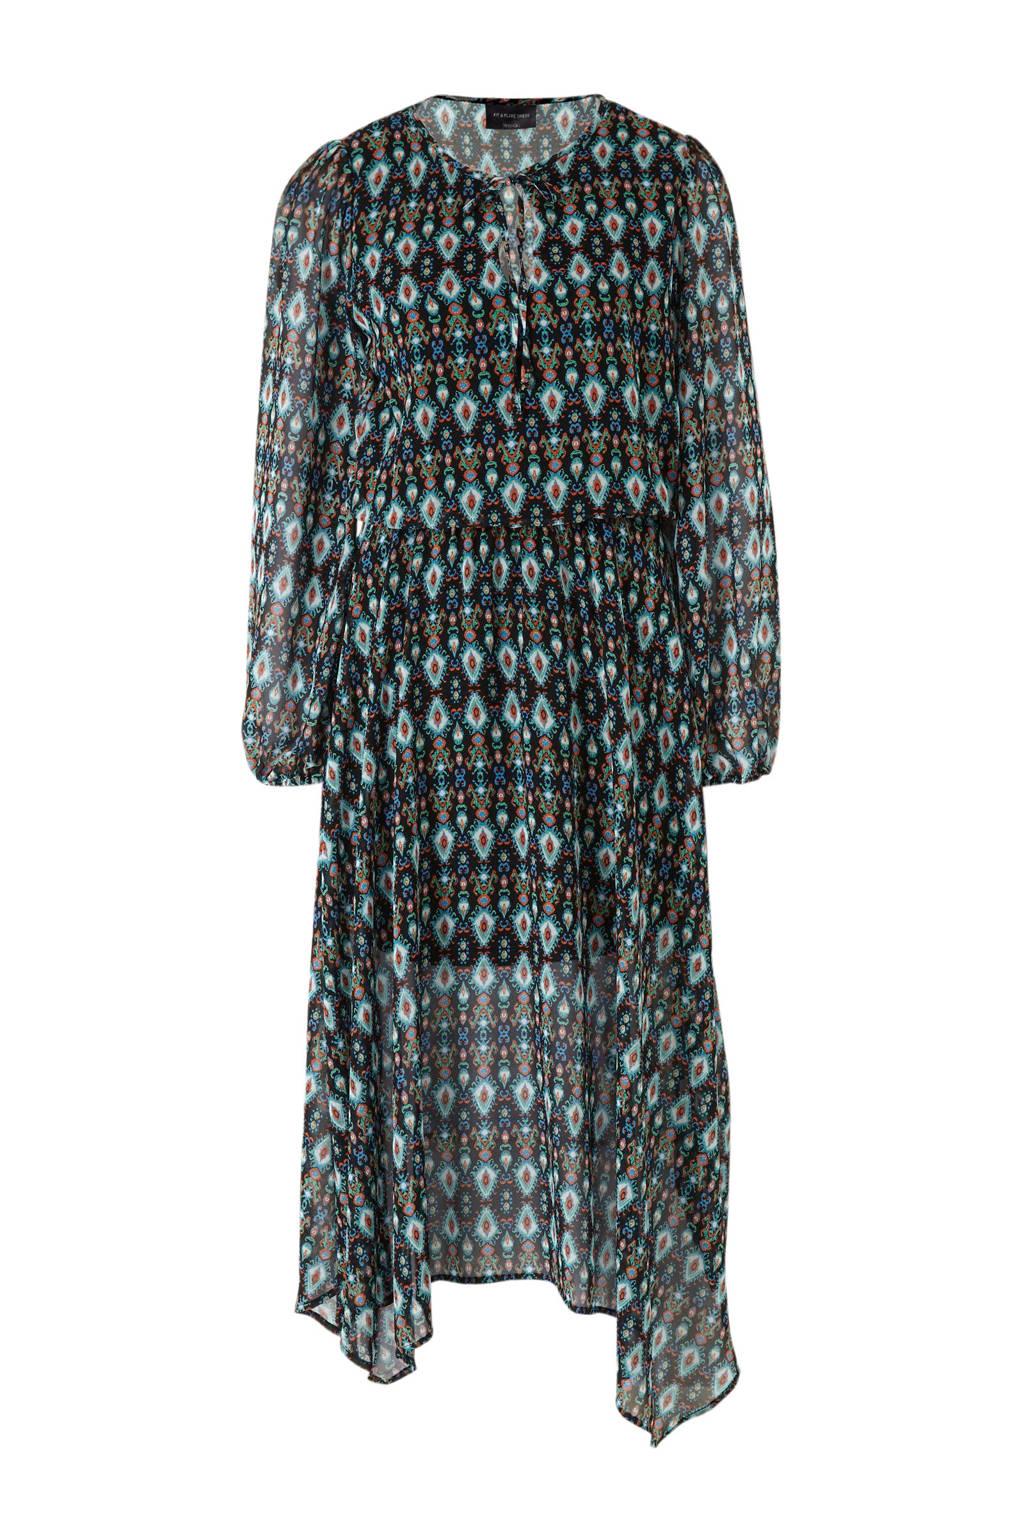 C&A Yessica jurk met all over print blauw, Blauw